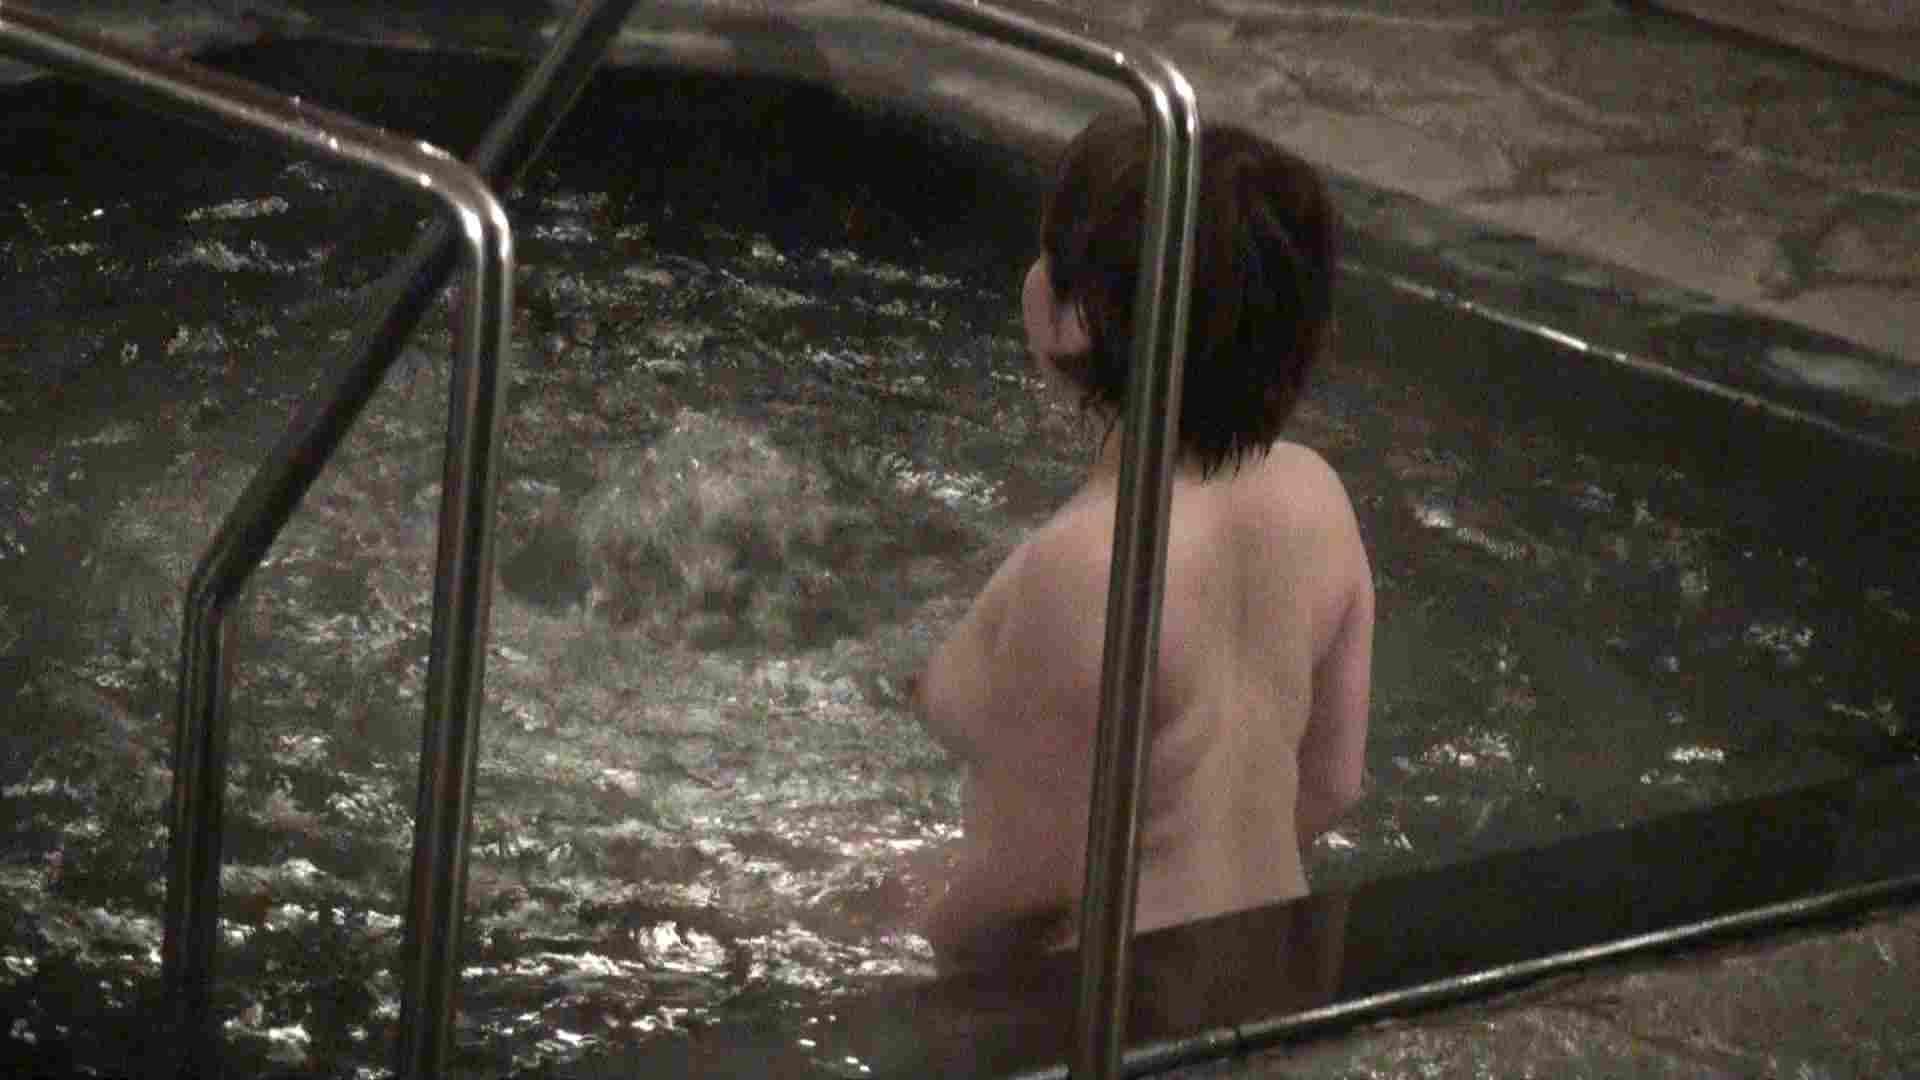 Aquaな露天風呂Vol.432 HなOL AV無料動画キャプチャ 111pic 97